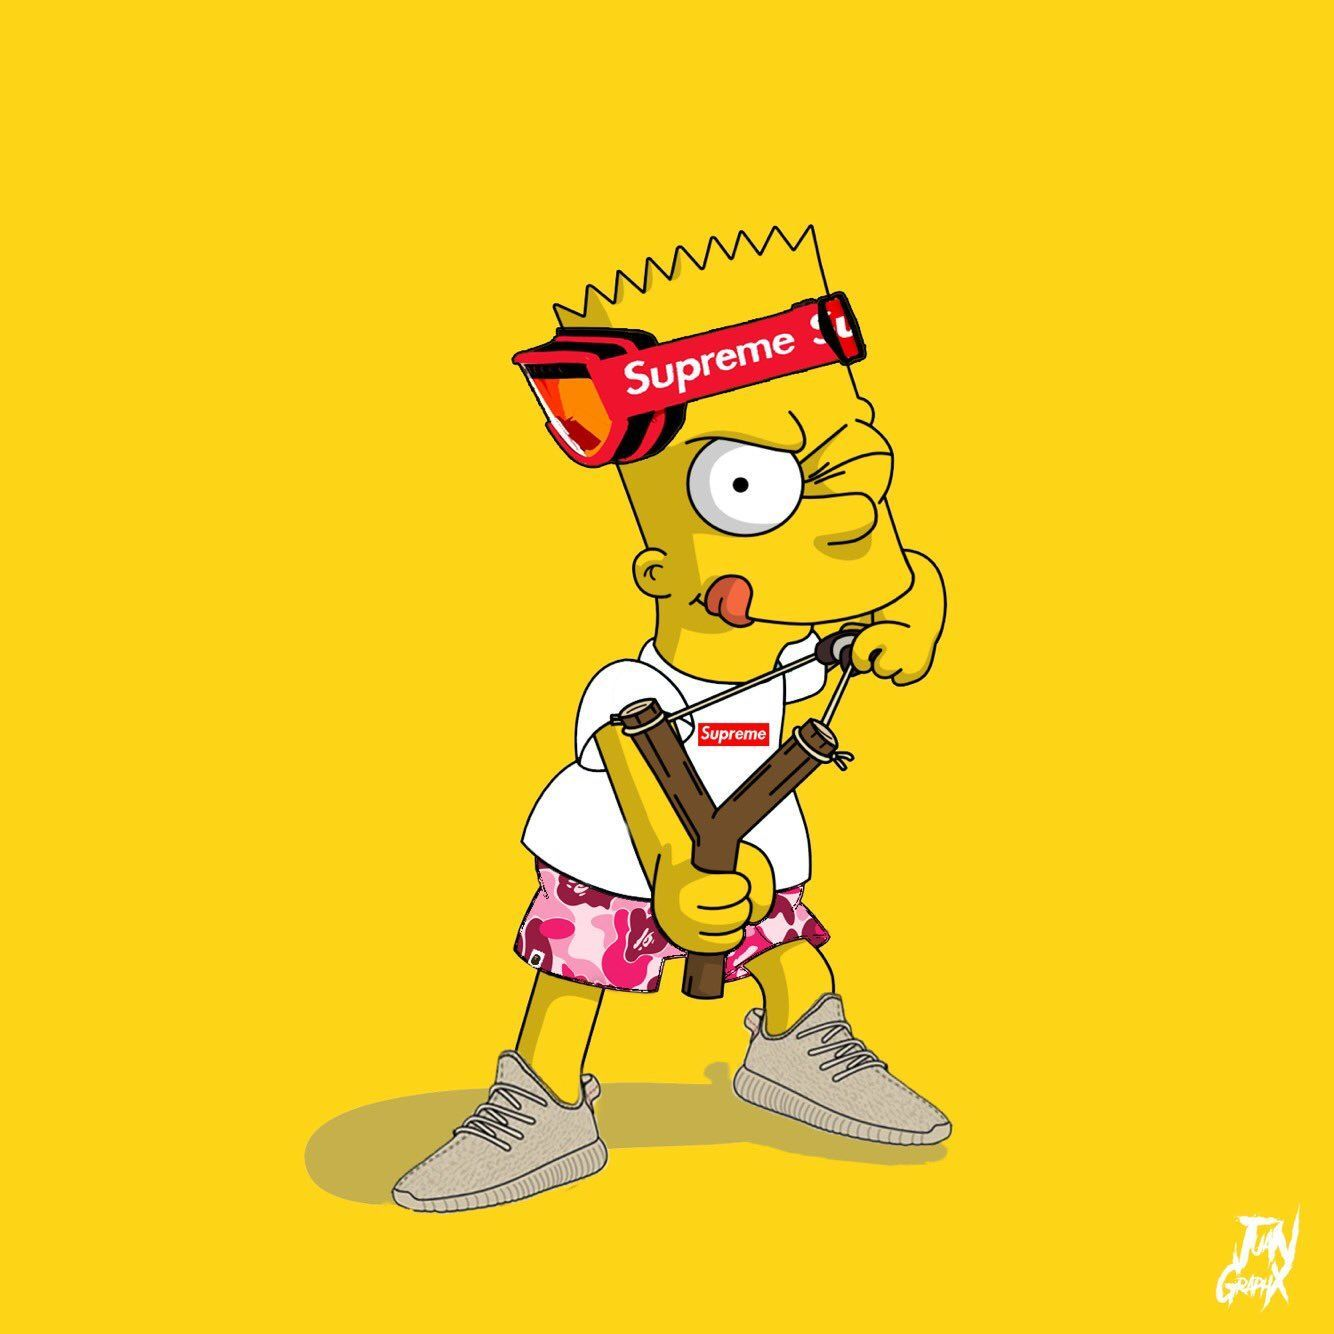 1334x1334 Bart Simpson Wallpaper Supreme Dazzle My Droid Tjn Iphone Walls 4 Bart Simpson Art Supreme Wallpaper Bart Simpson